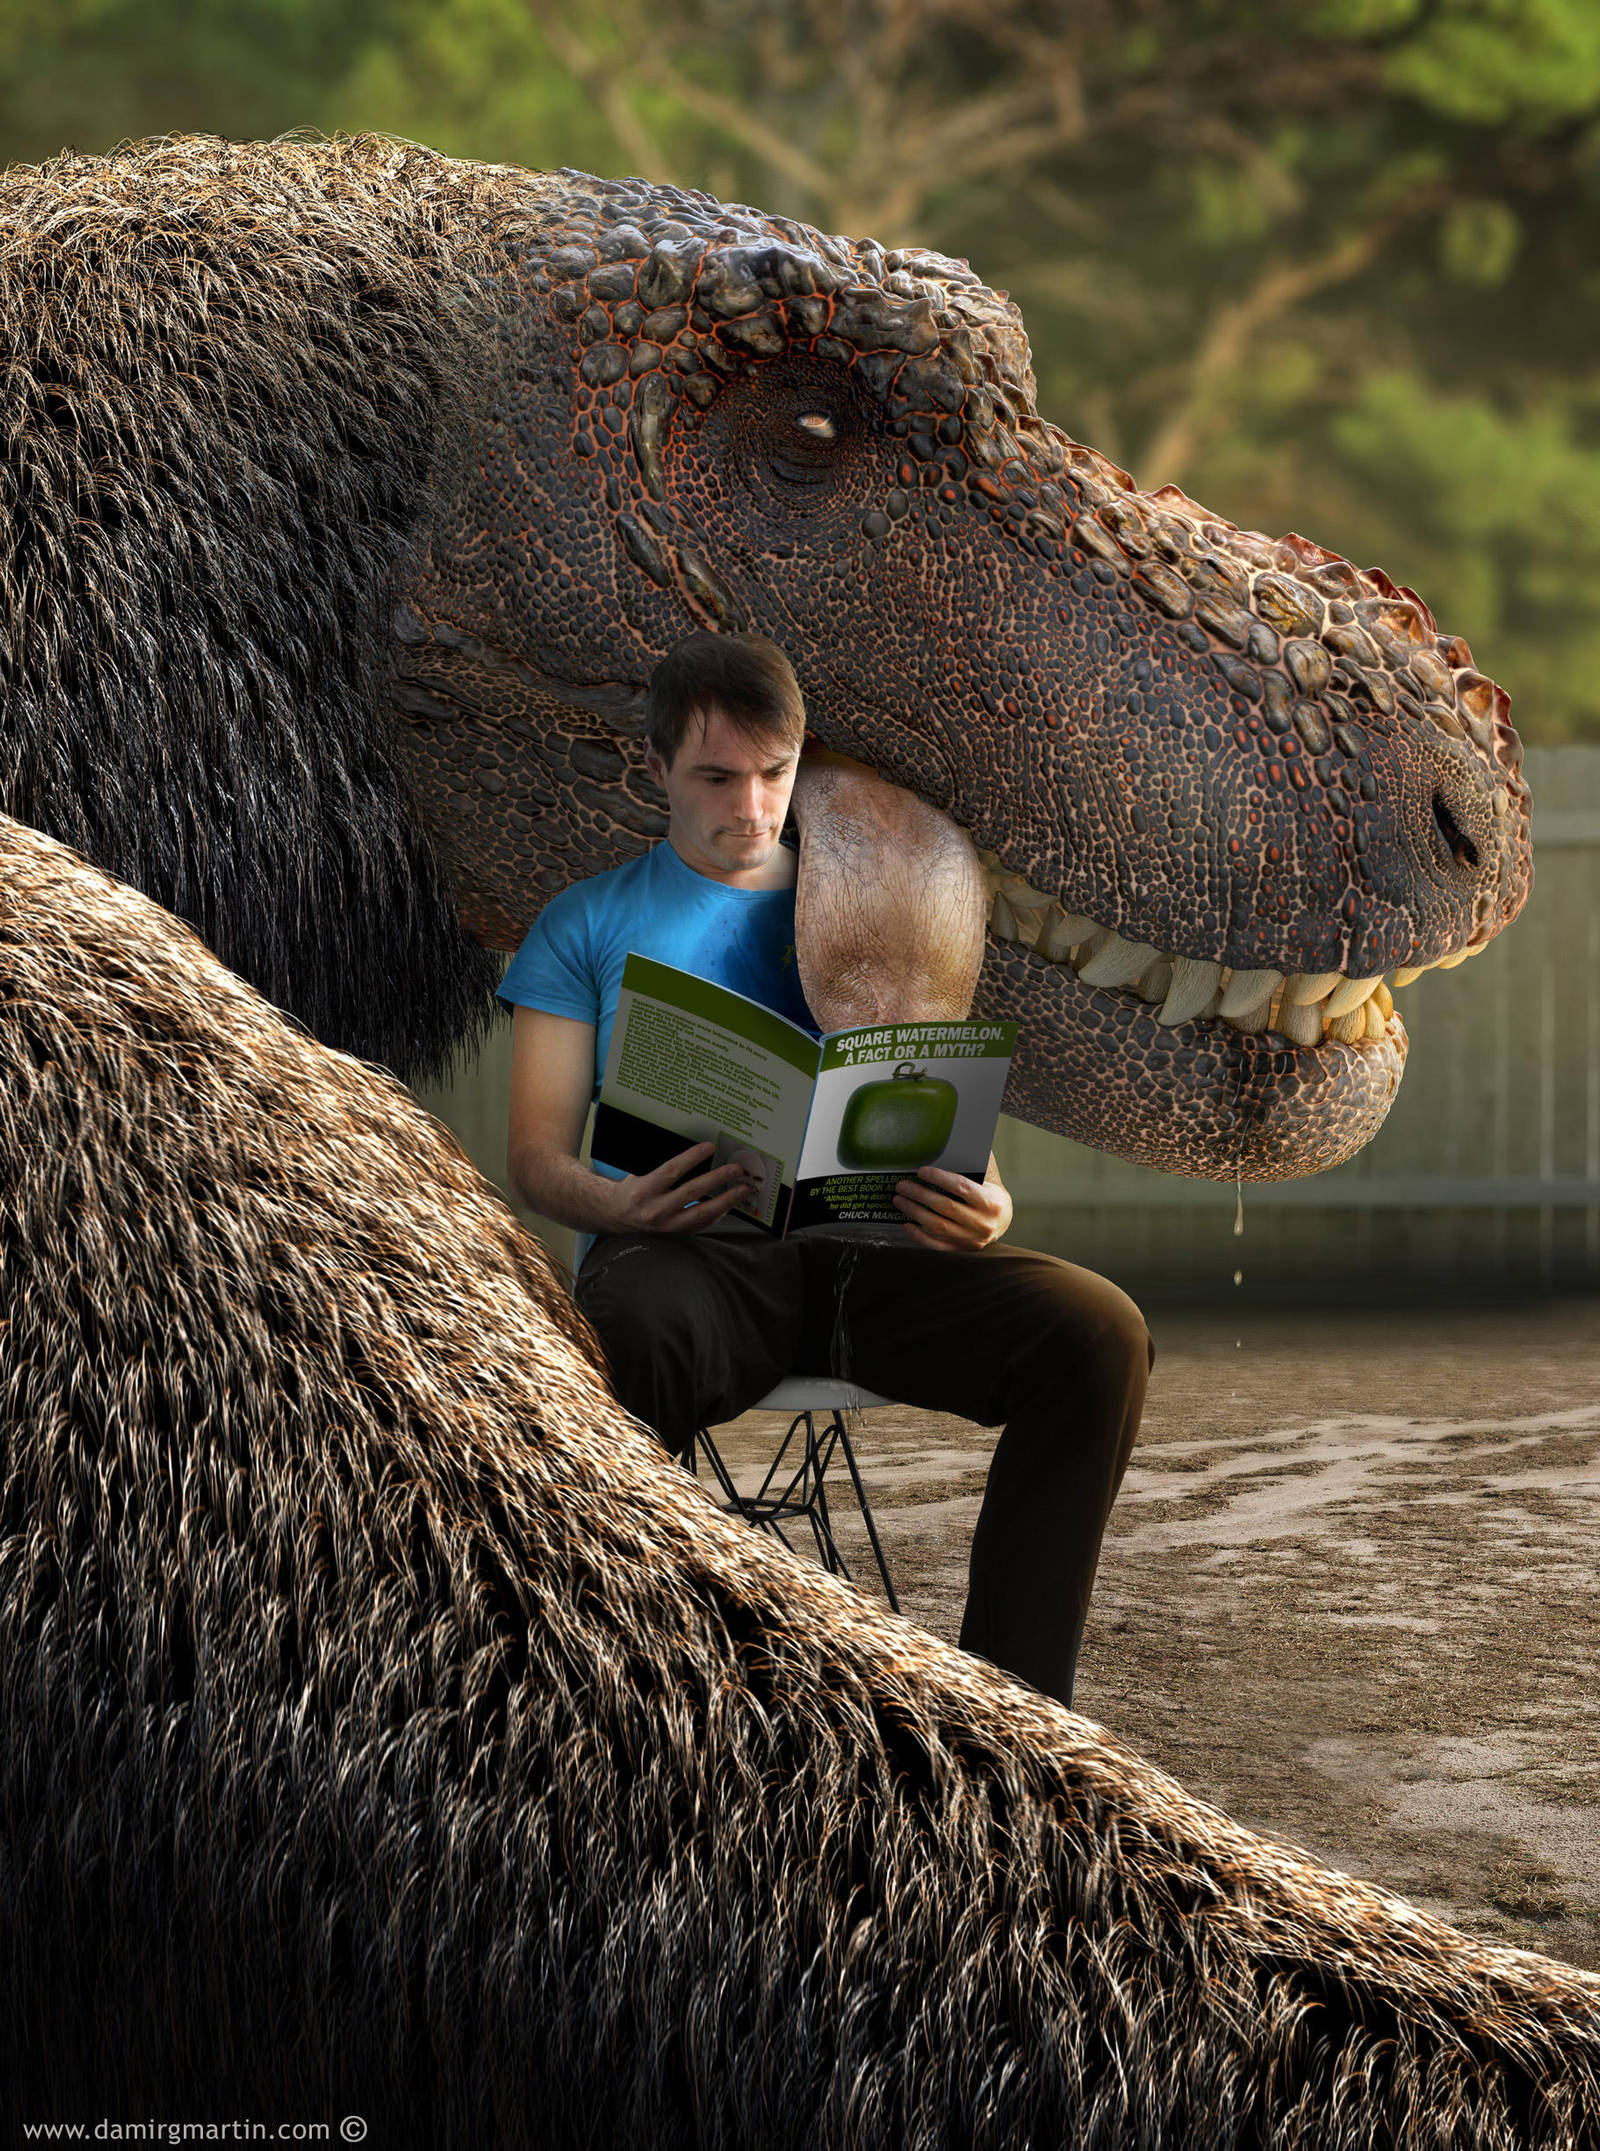 Book Time by damir-g-martin